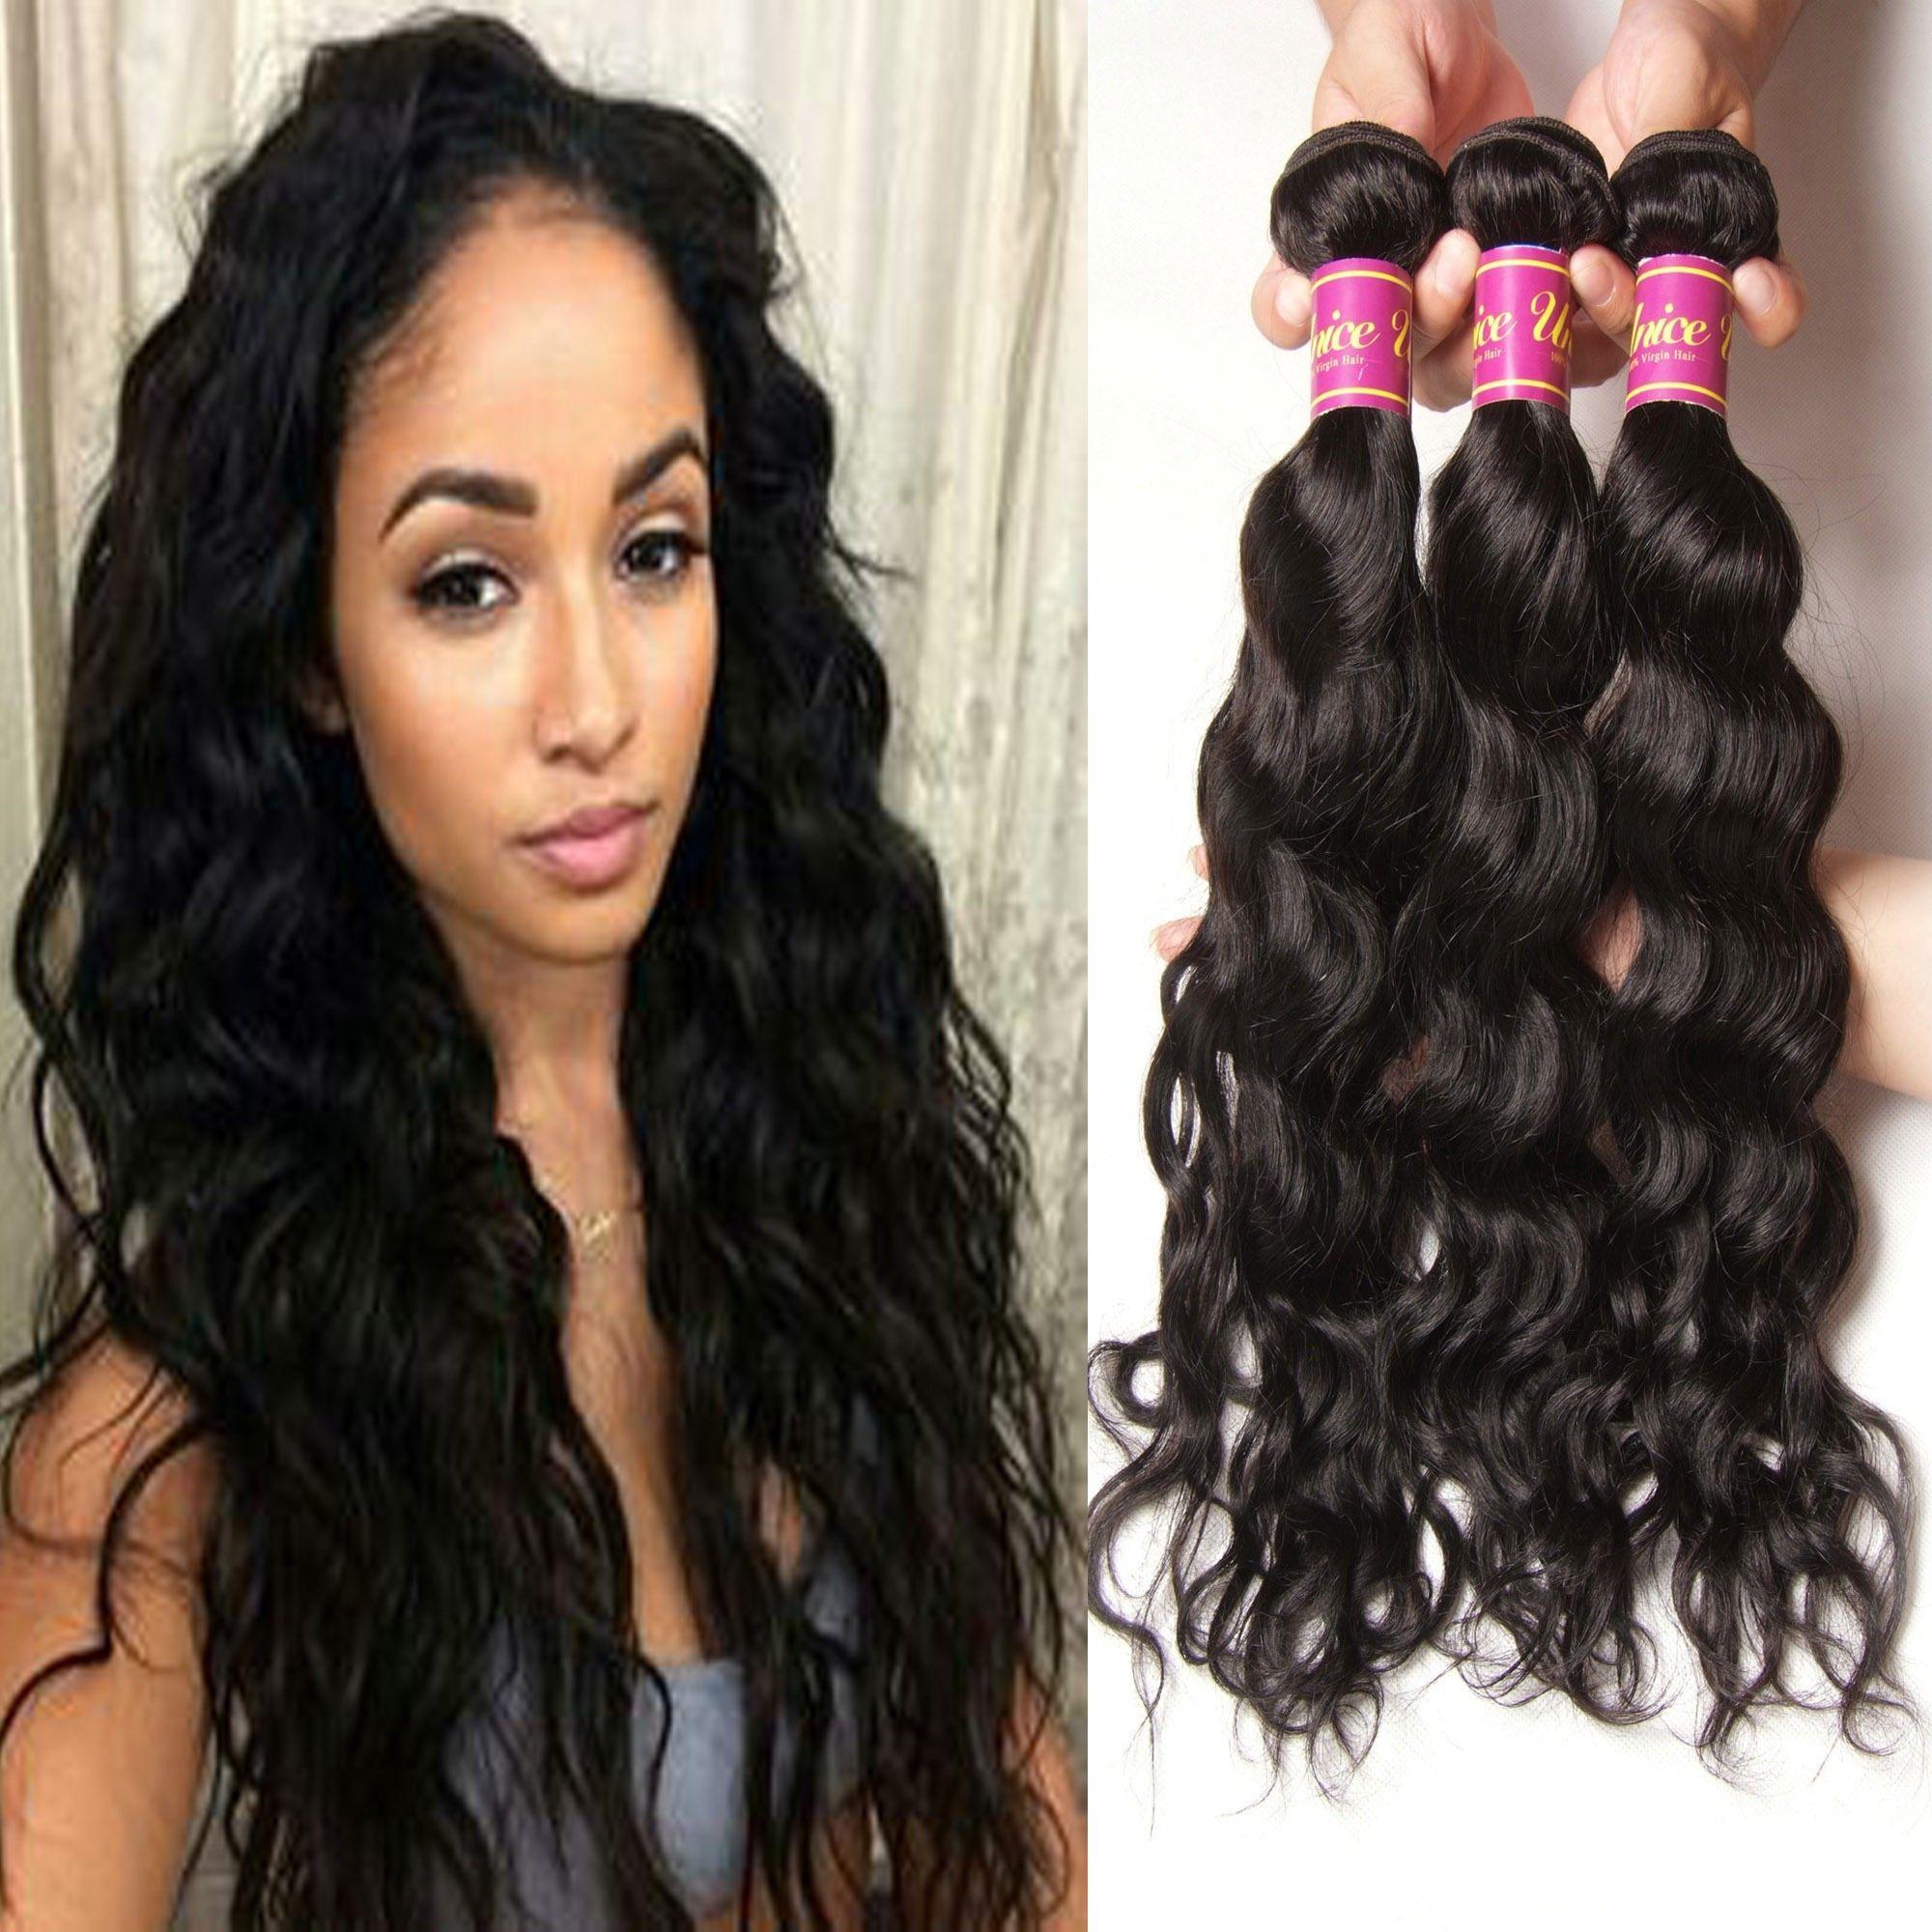 Hair Icenu Series Peruvian Human Hair Bundles Natural Wave 3pcslot